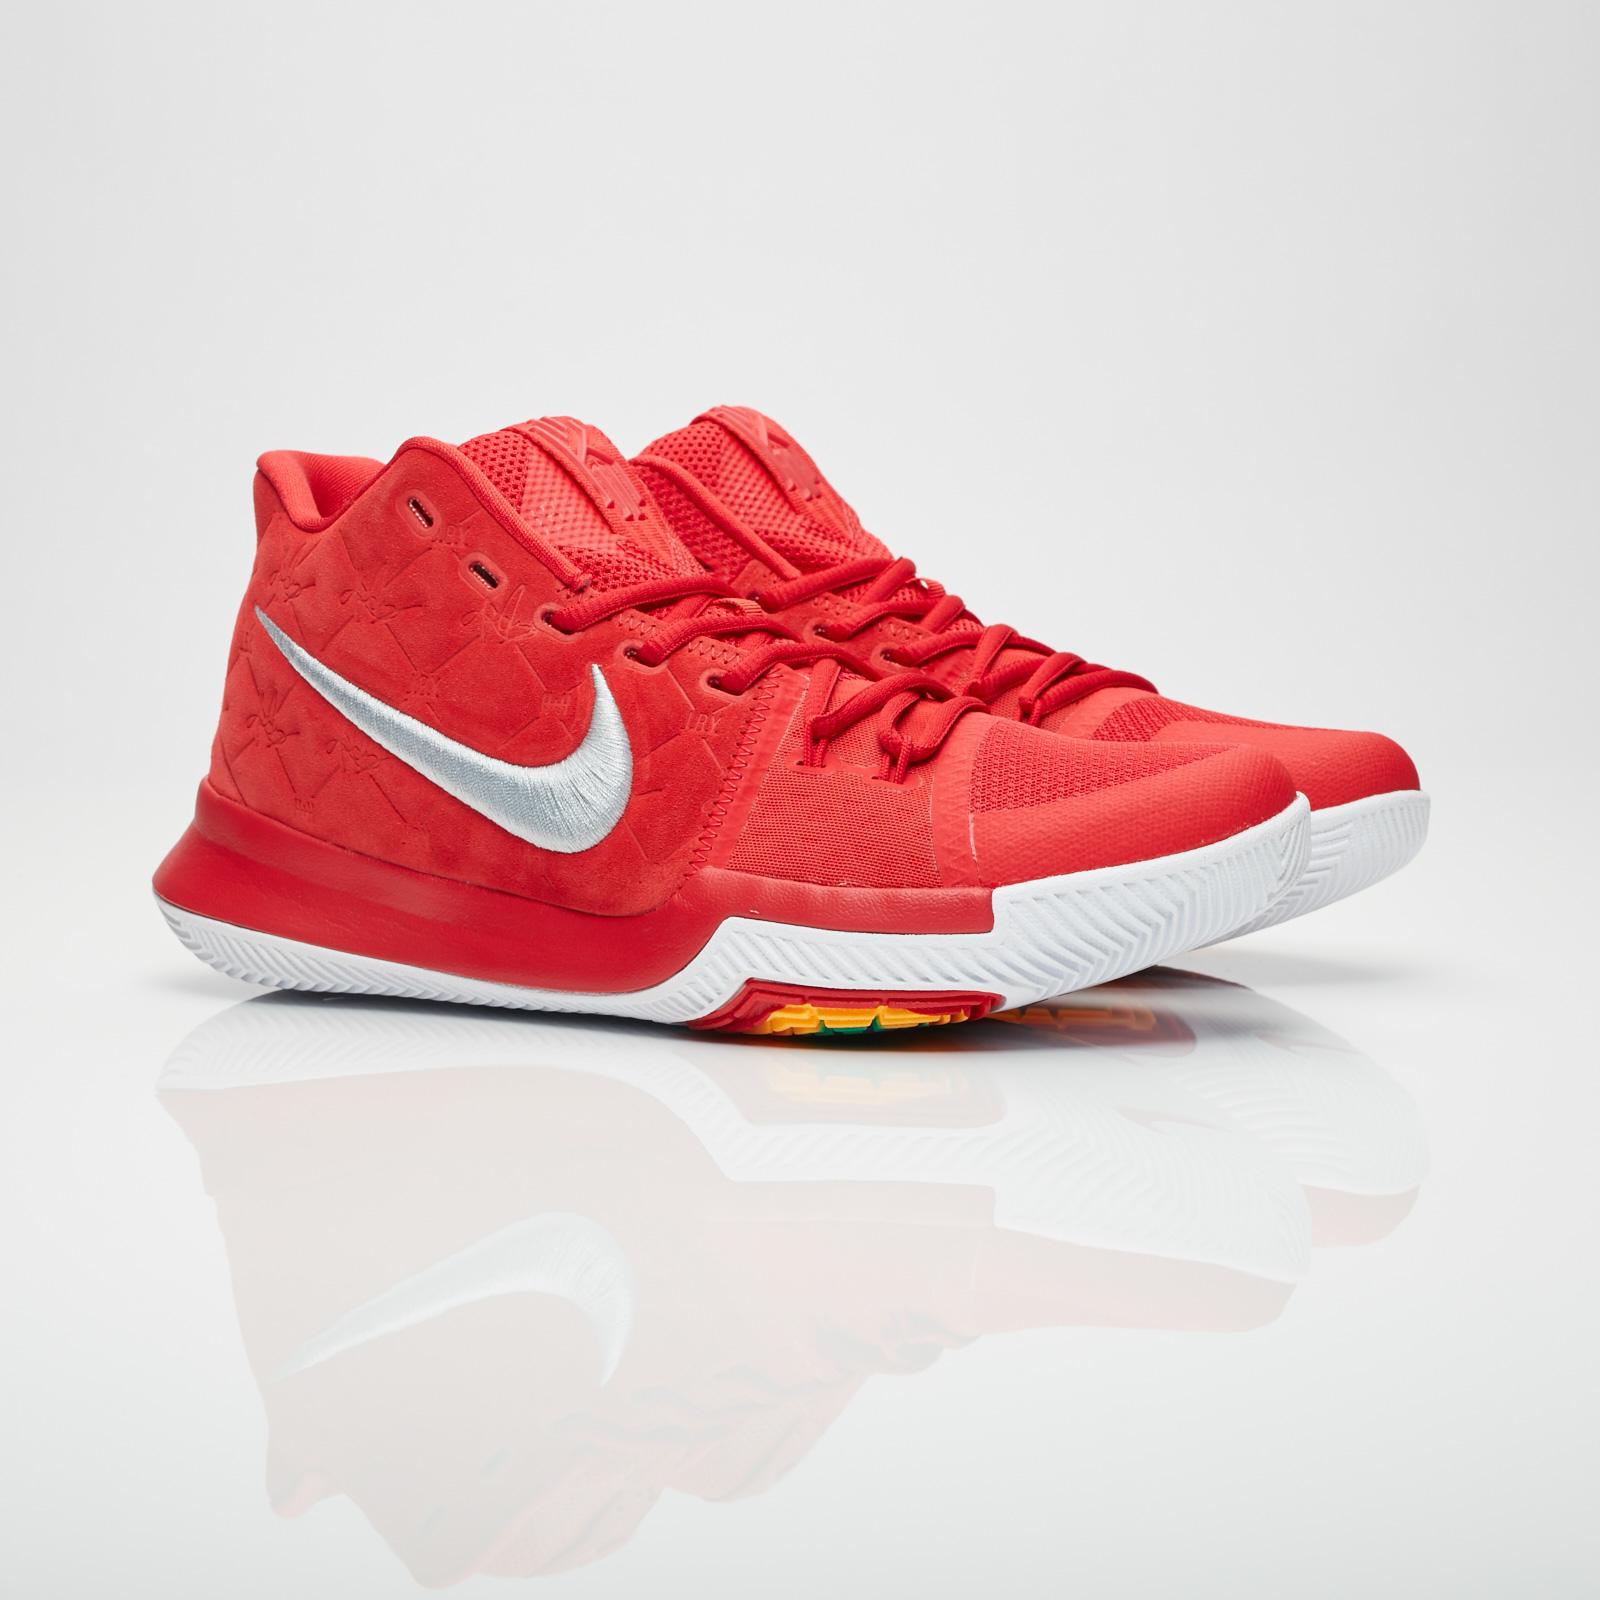 3c34fb1bb18b Nike Kyrie 3 - 852395-601 - Sneakersnstuff